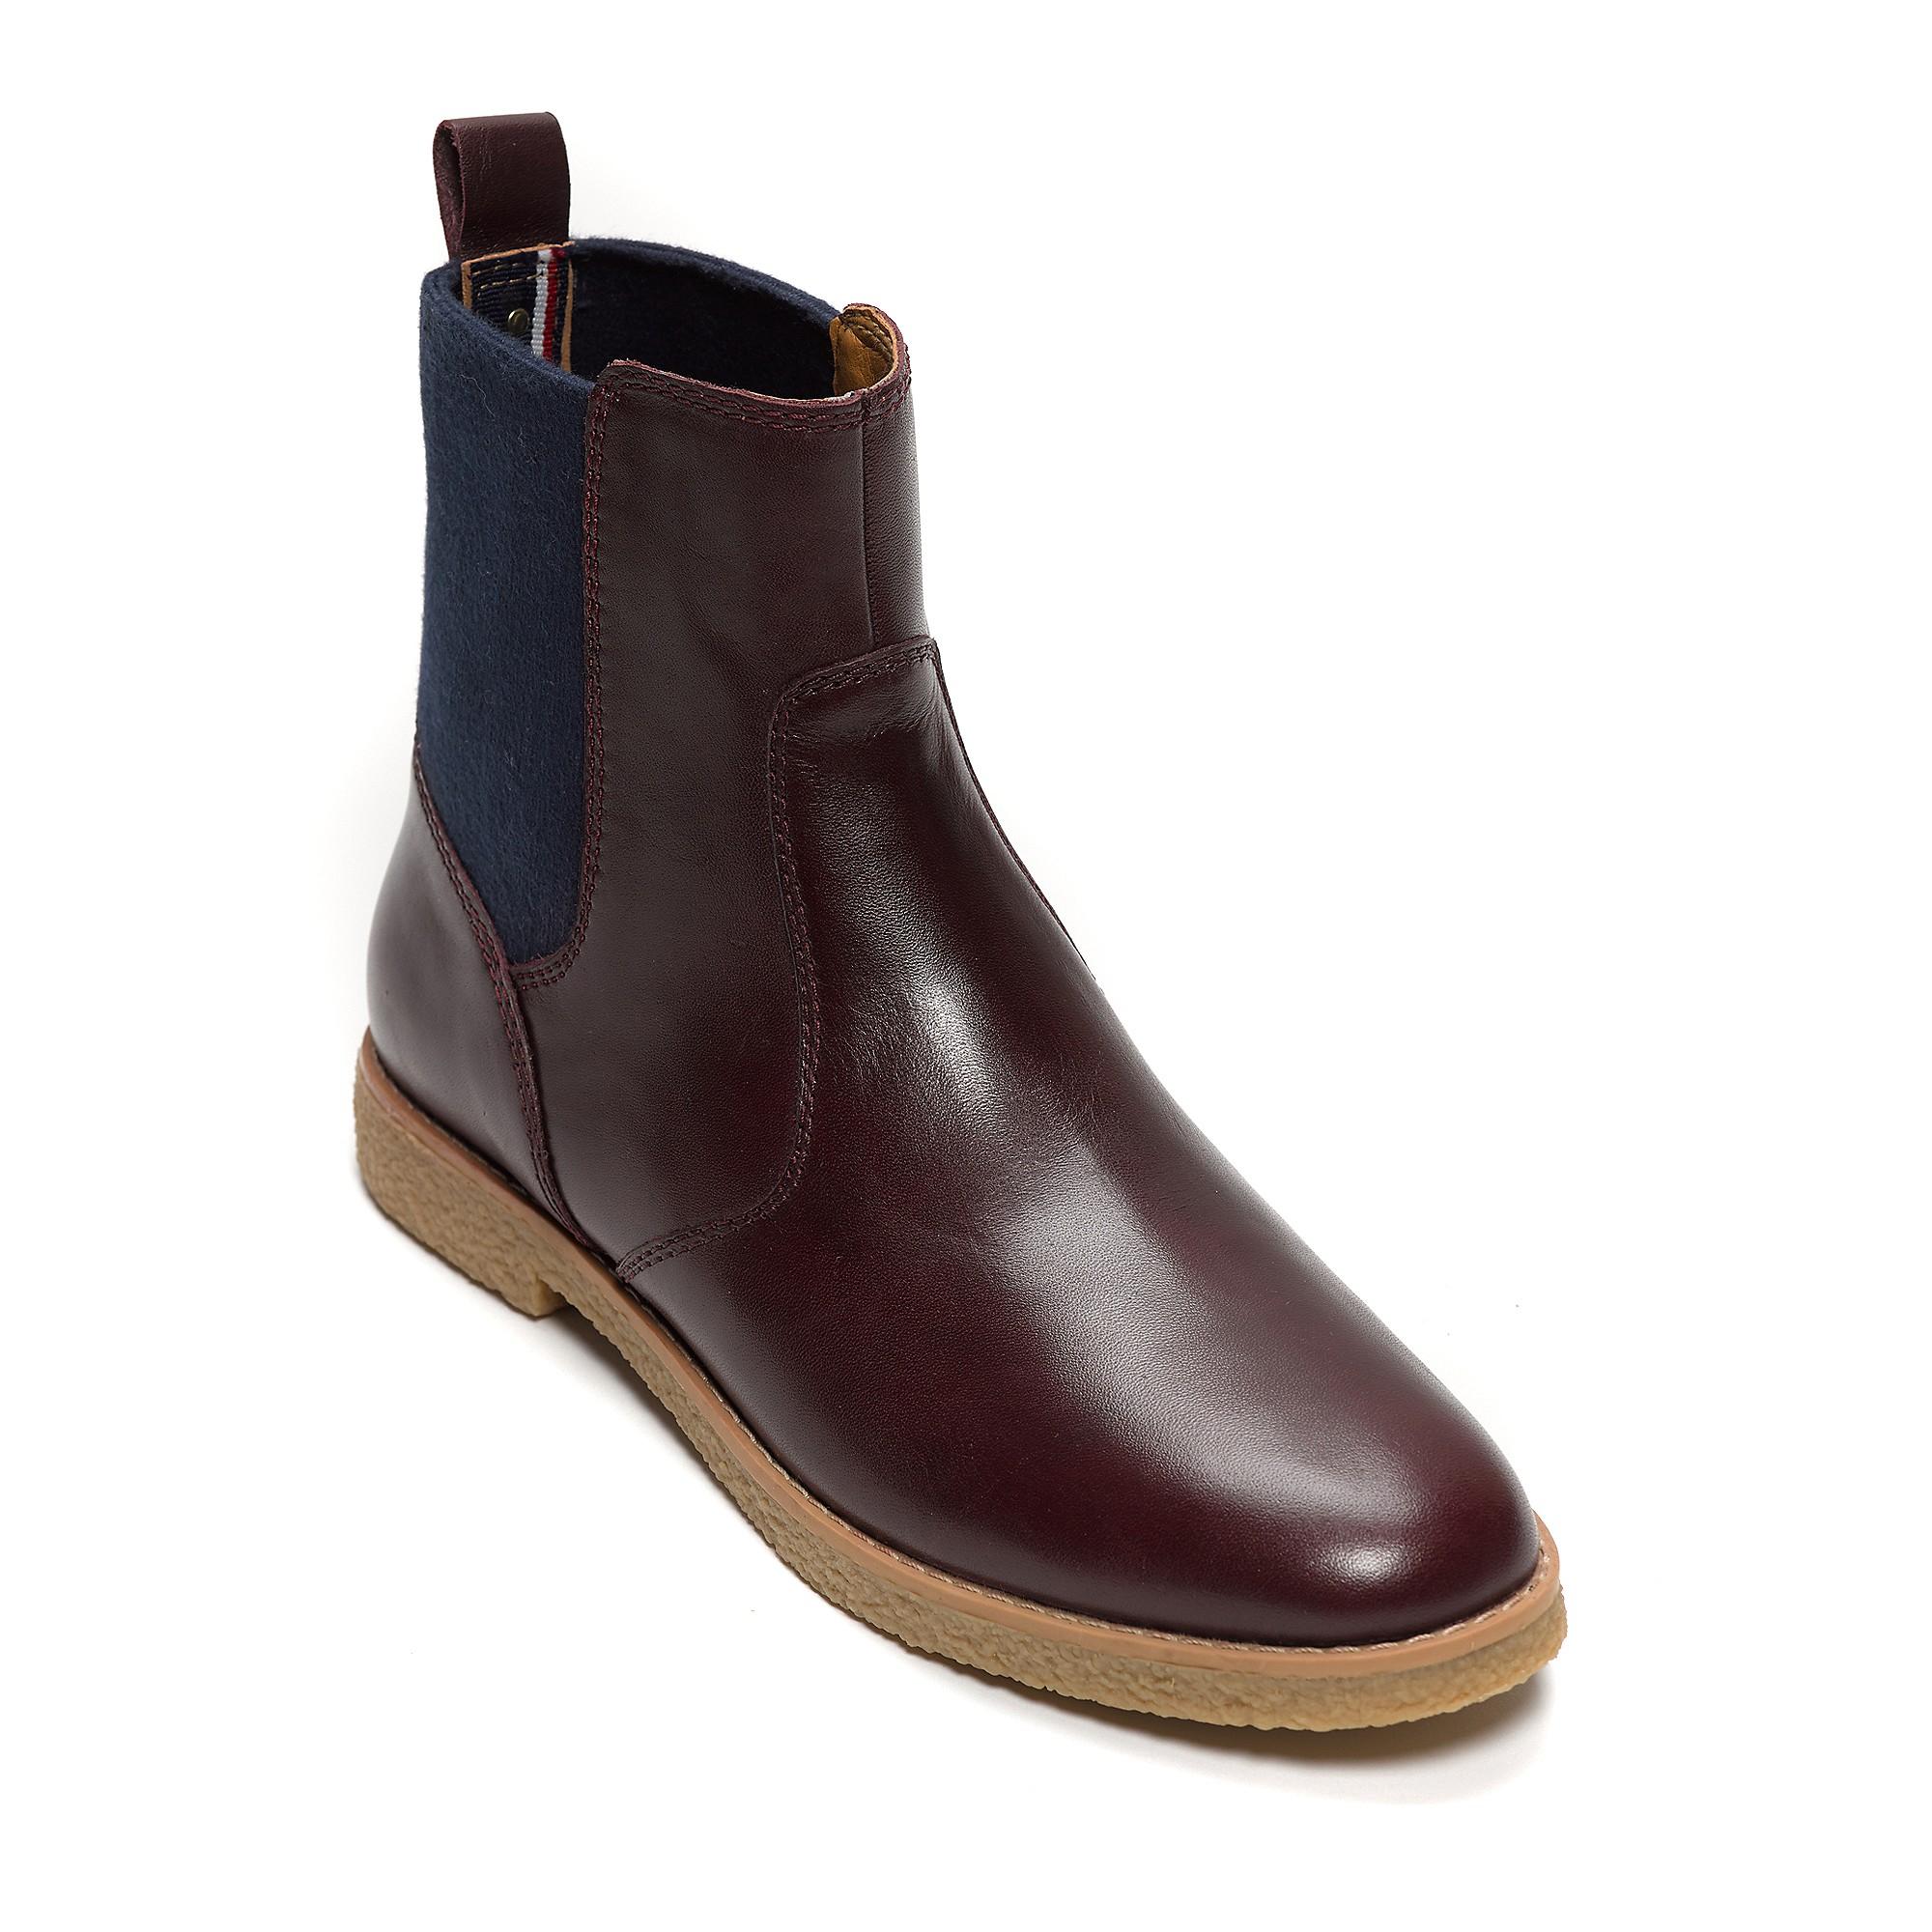 tommy hilfiger suede shoe boot in brown baked plum marine lyst. Black Bedroom Furniture Sets. Home Design Ideas